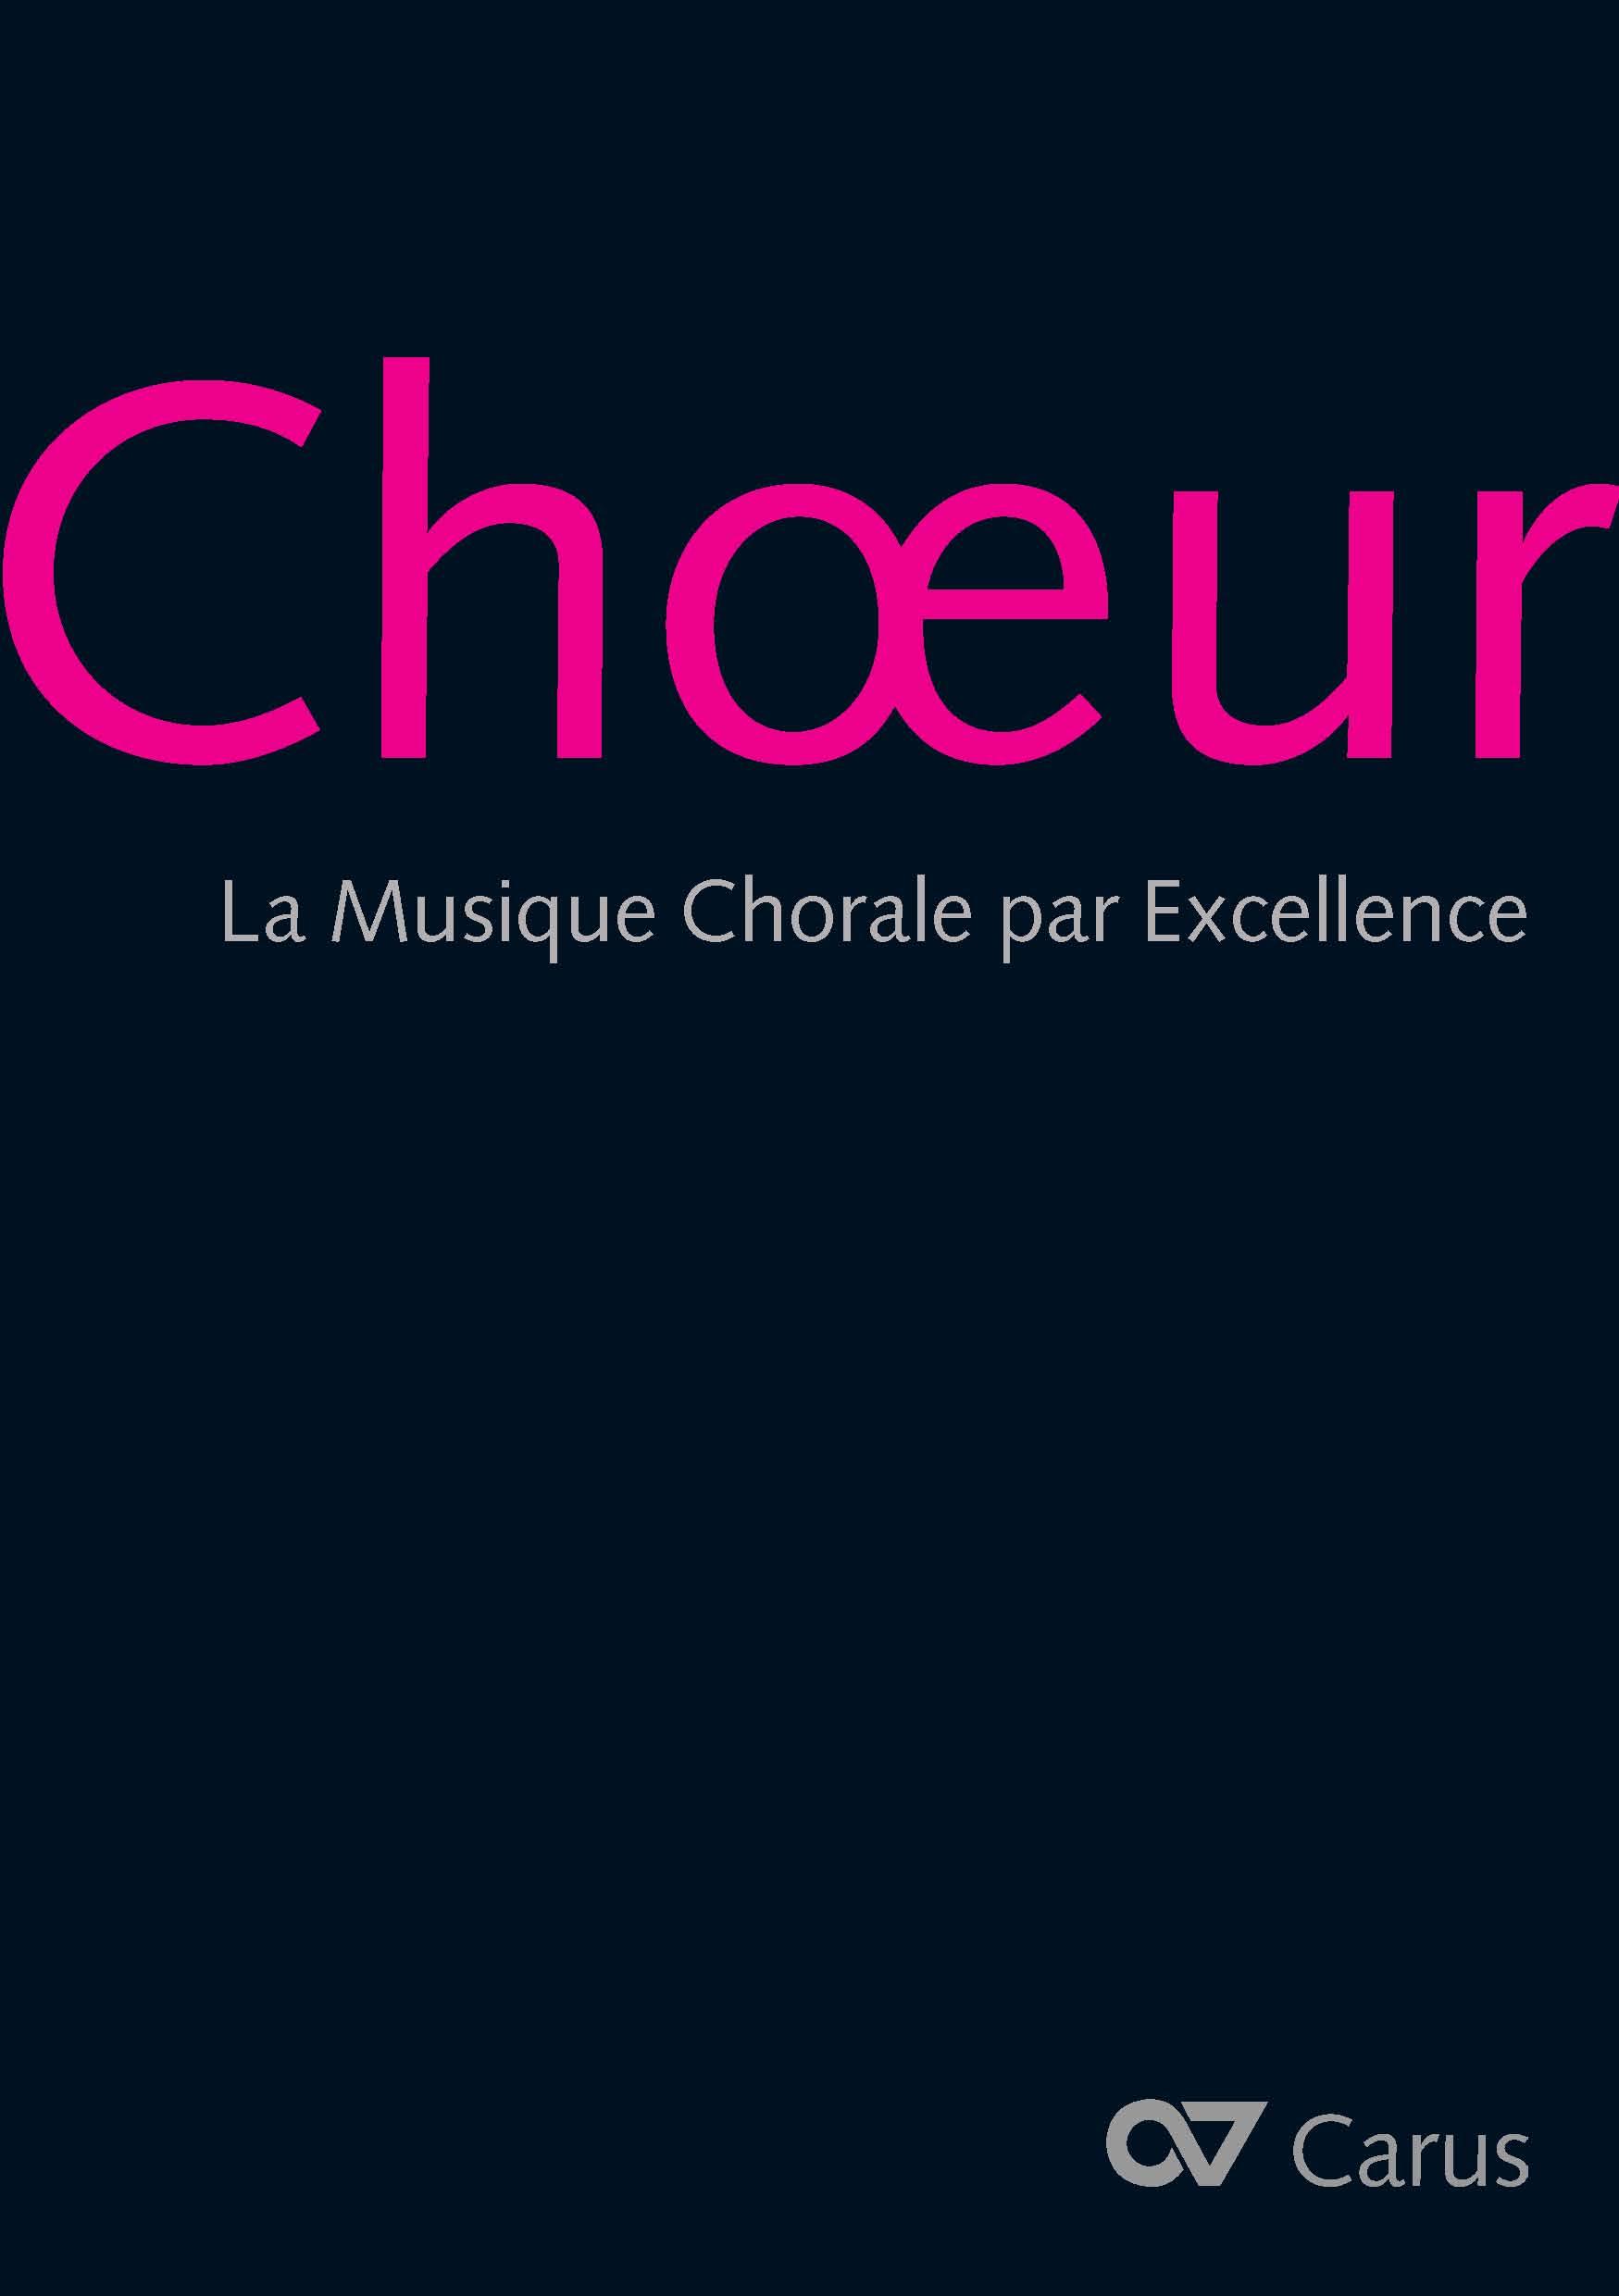 https://carusmedia.com/images-intern/medien/img/kataloge/Motetten_Madrigale_Choere.jpg